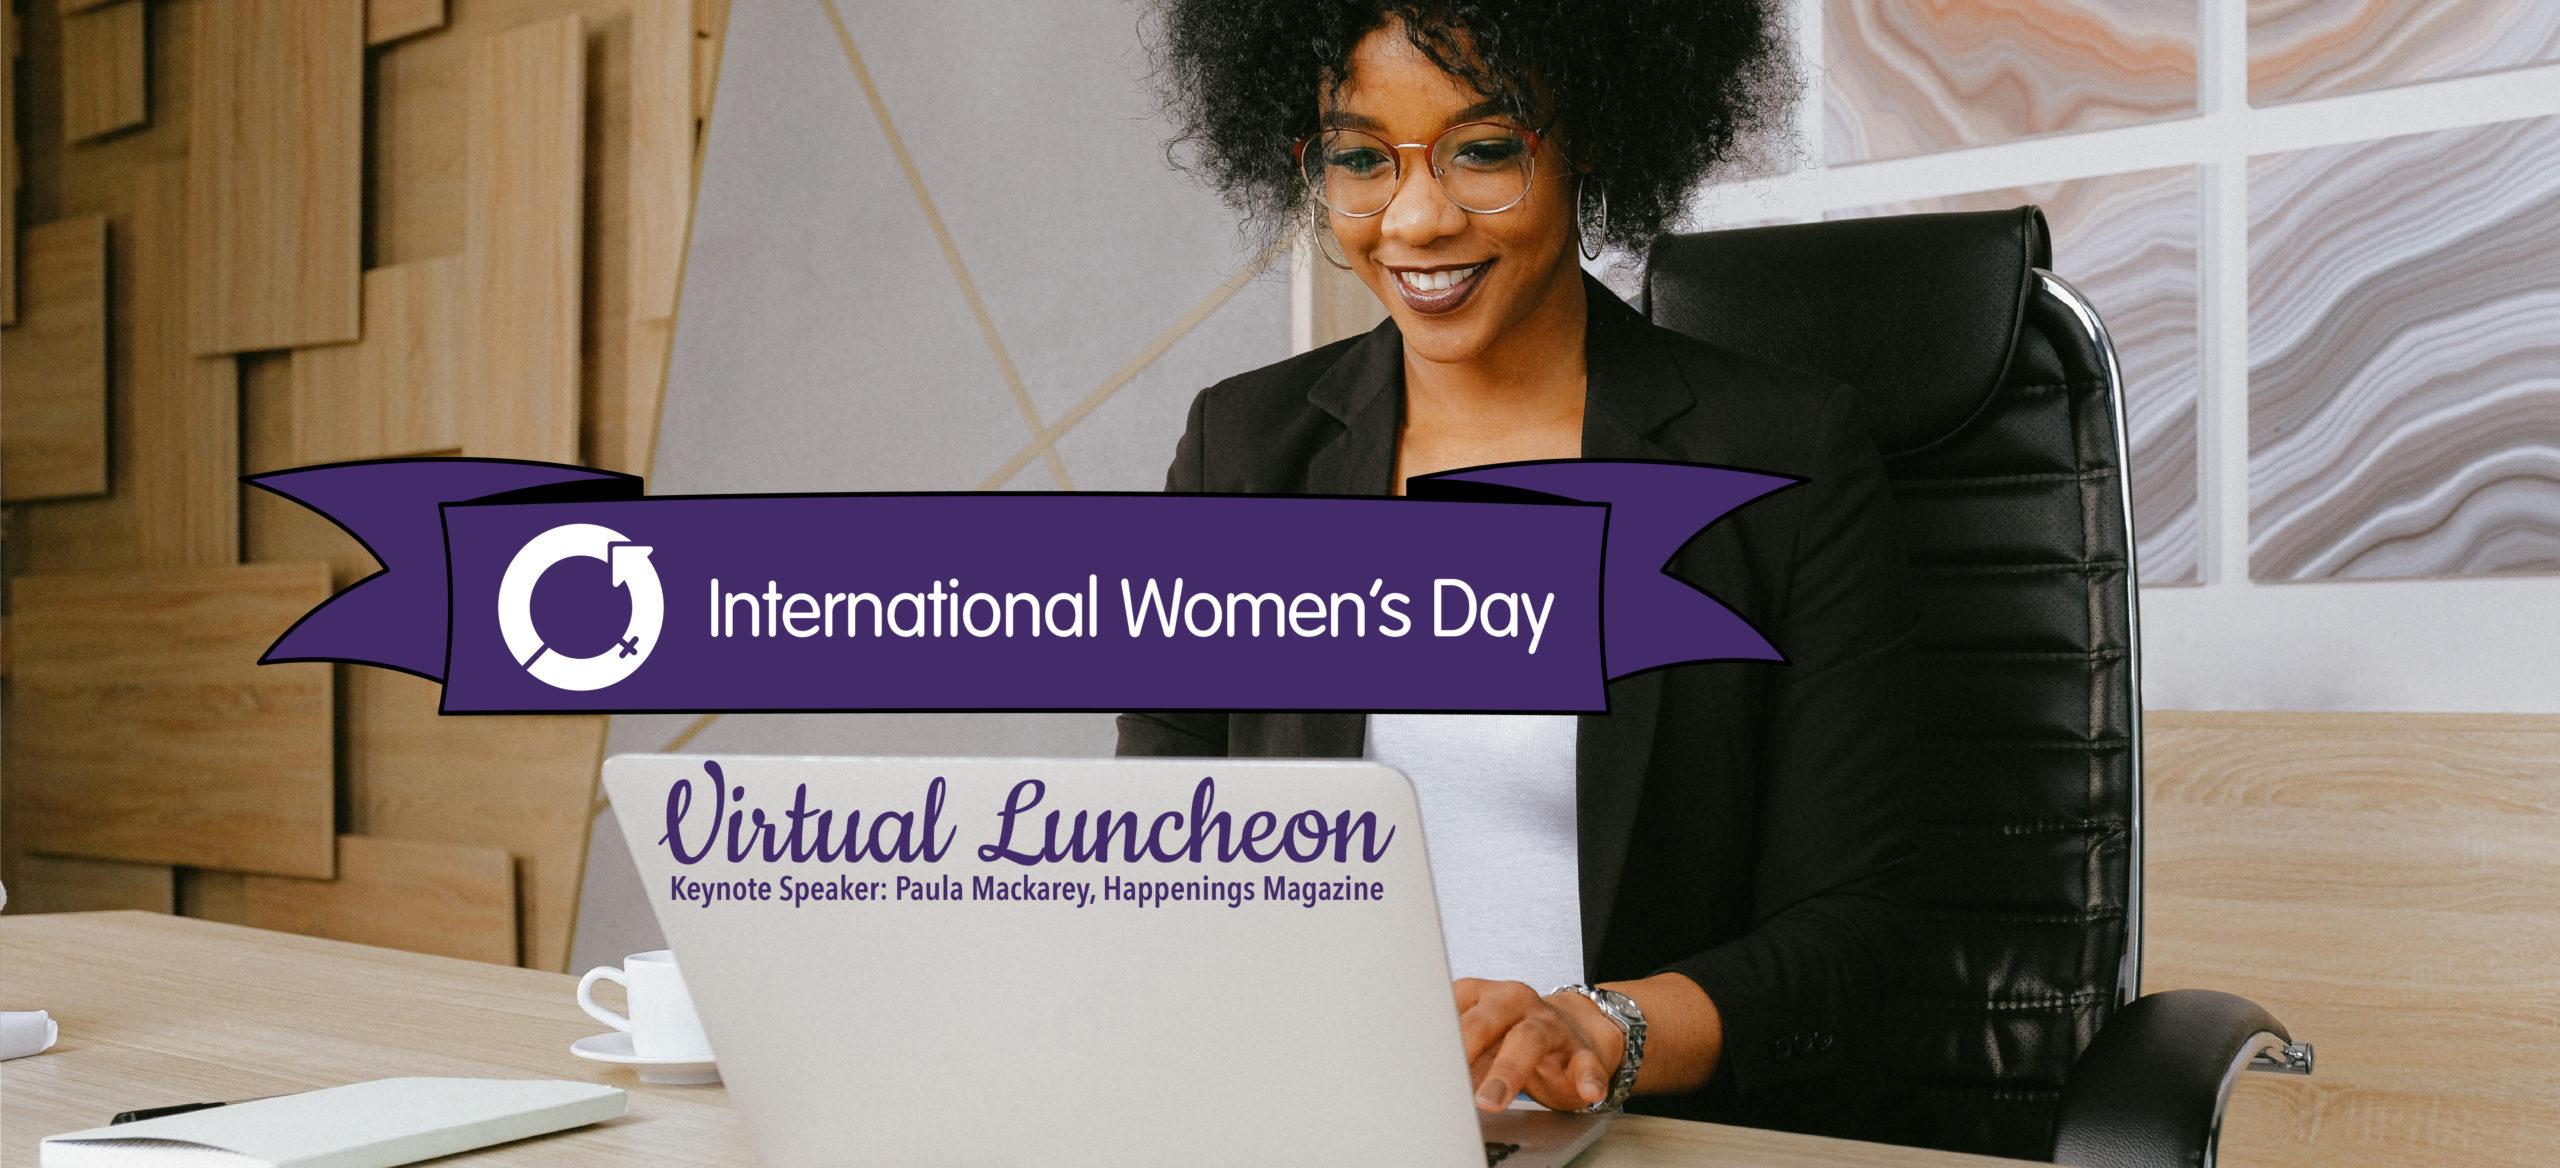 International Women's Day Virtual Luncheon